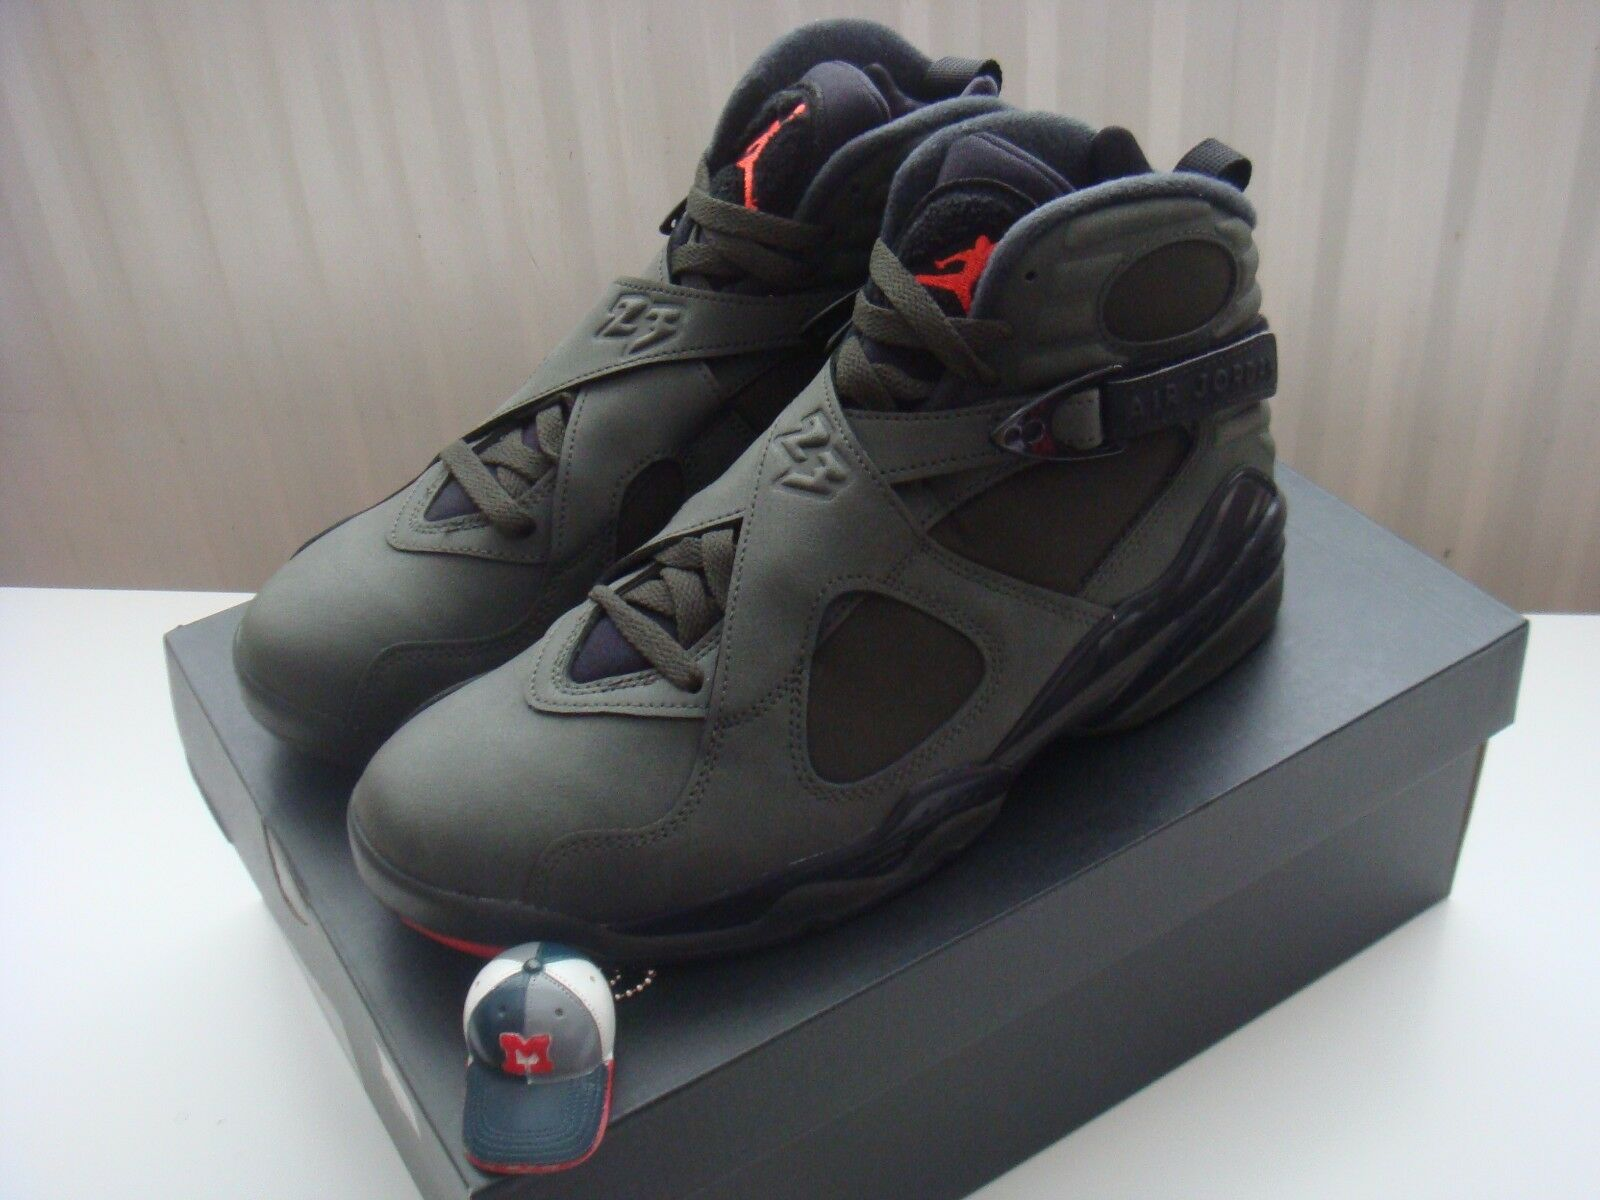 Nike Air Jordan VIII 8 Retro Take Flight 9.5/UK Etats-Unis 8.5 Olive/Undftd/Playoff/Aqua